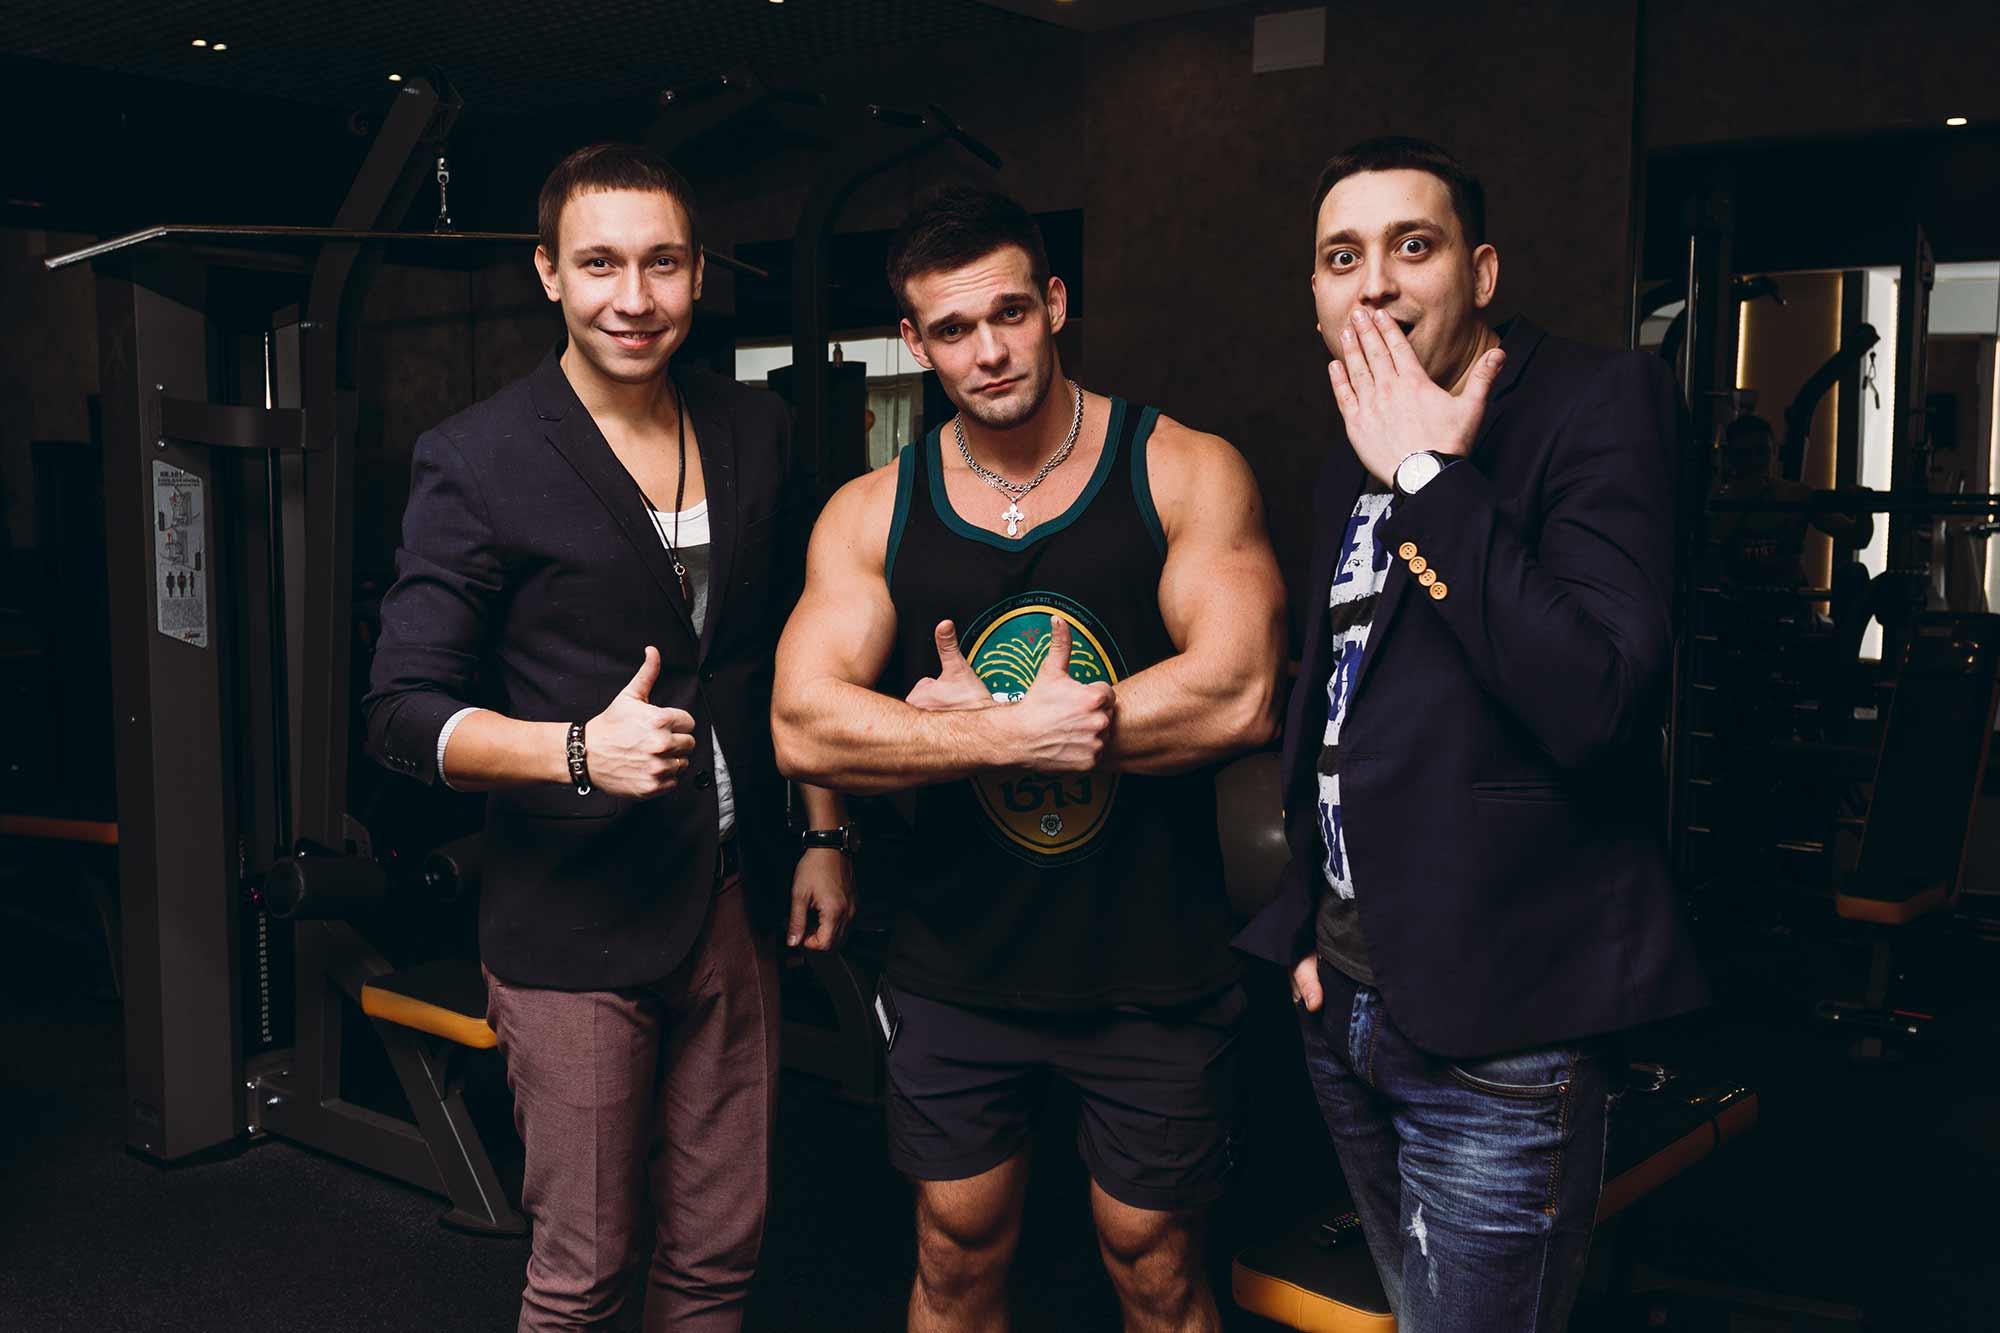 Открытие фитнес-клуба Неофит